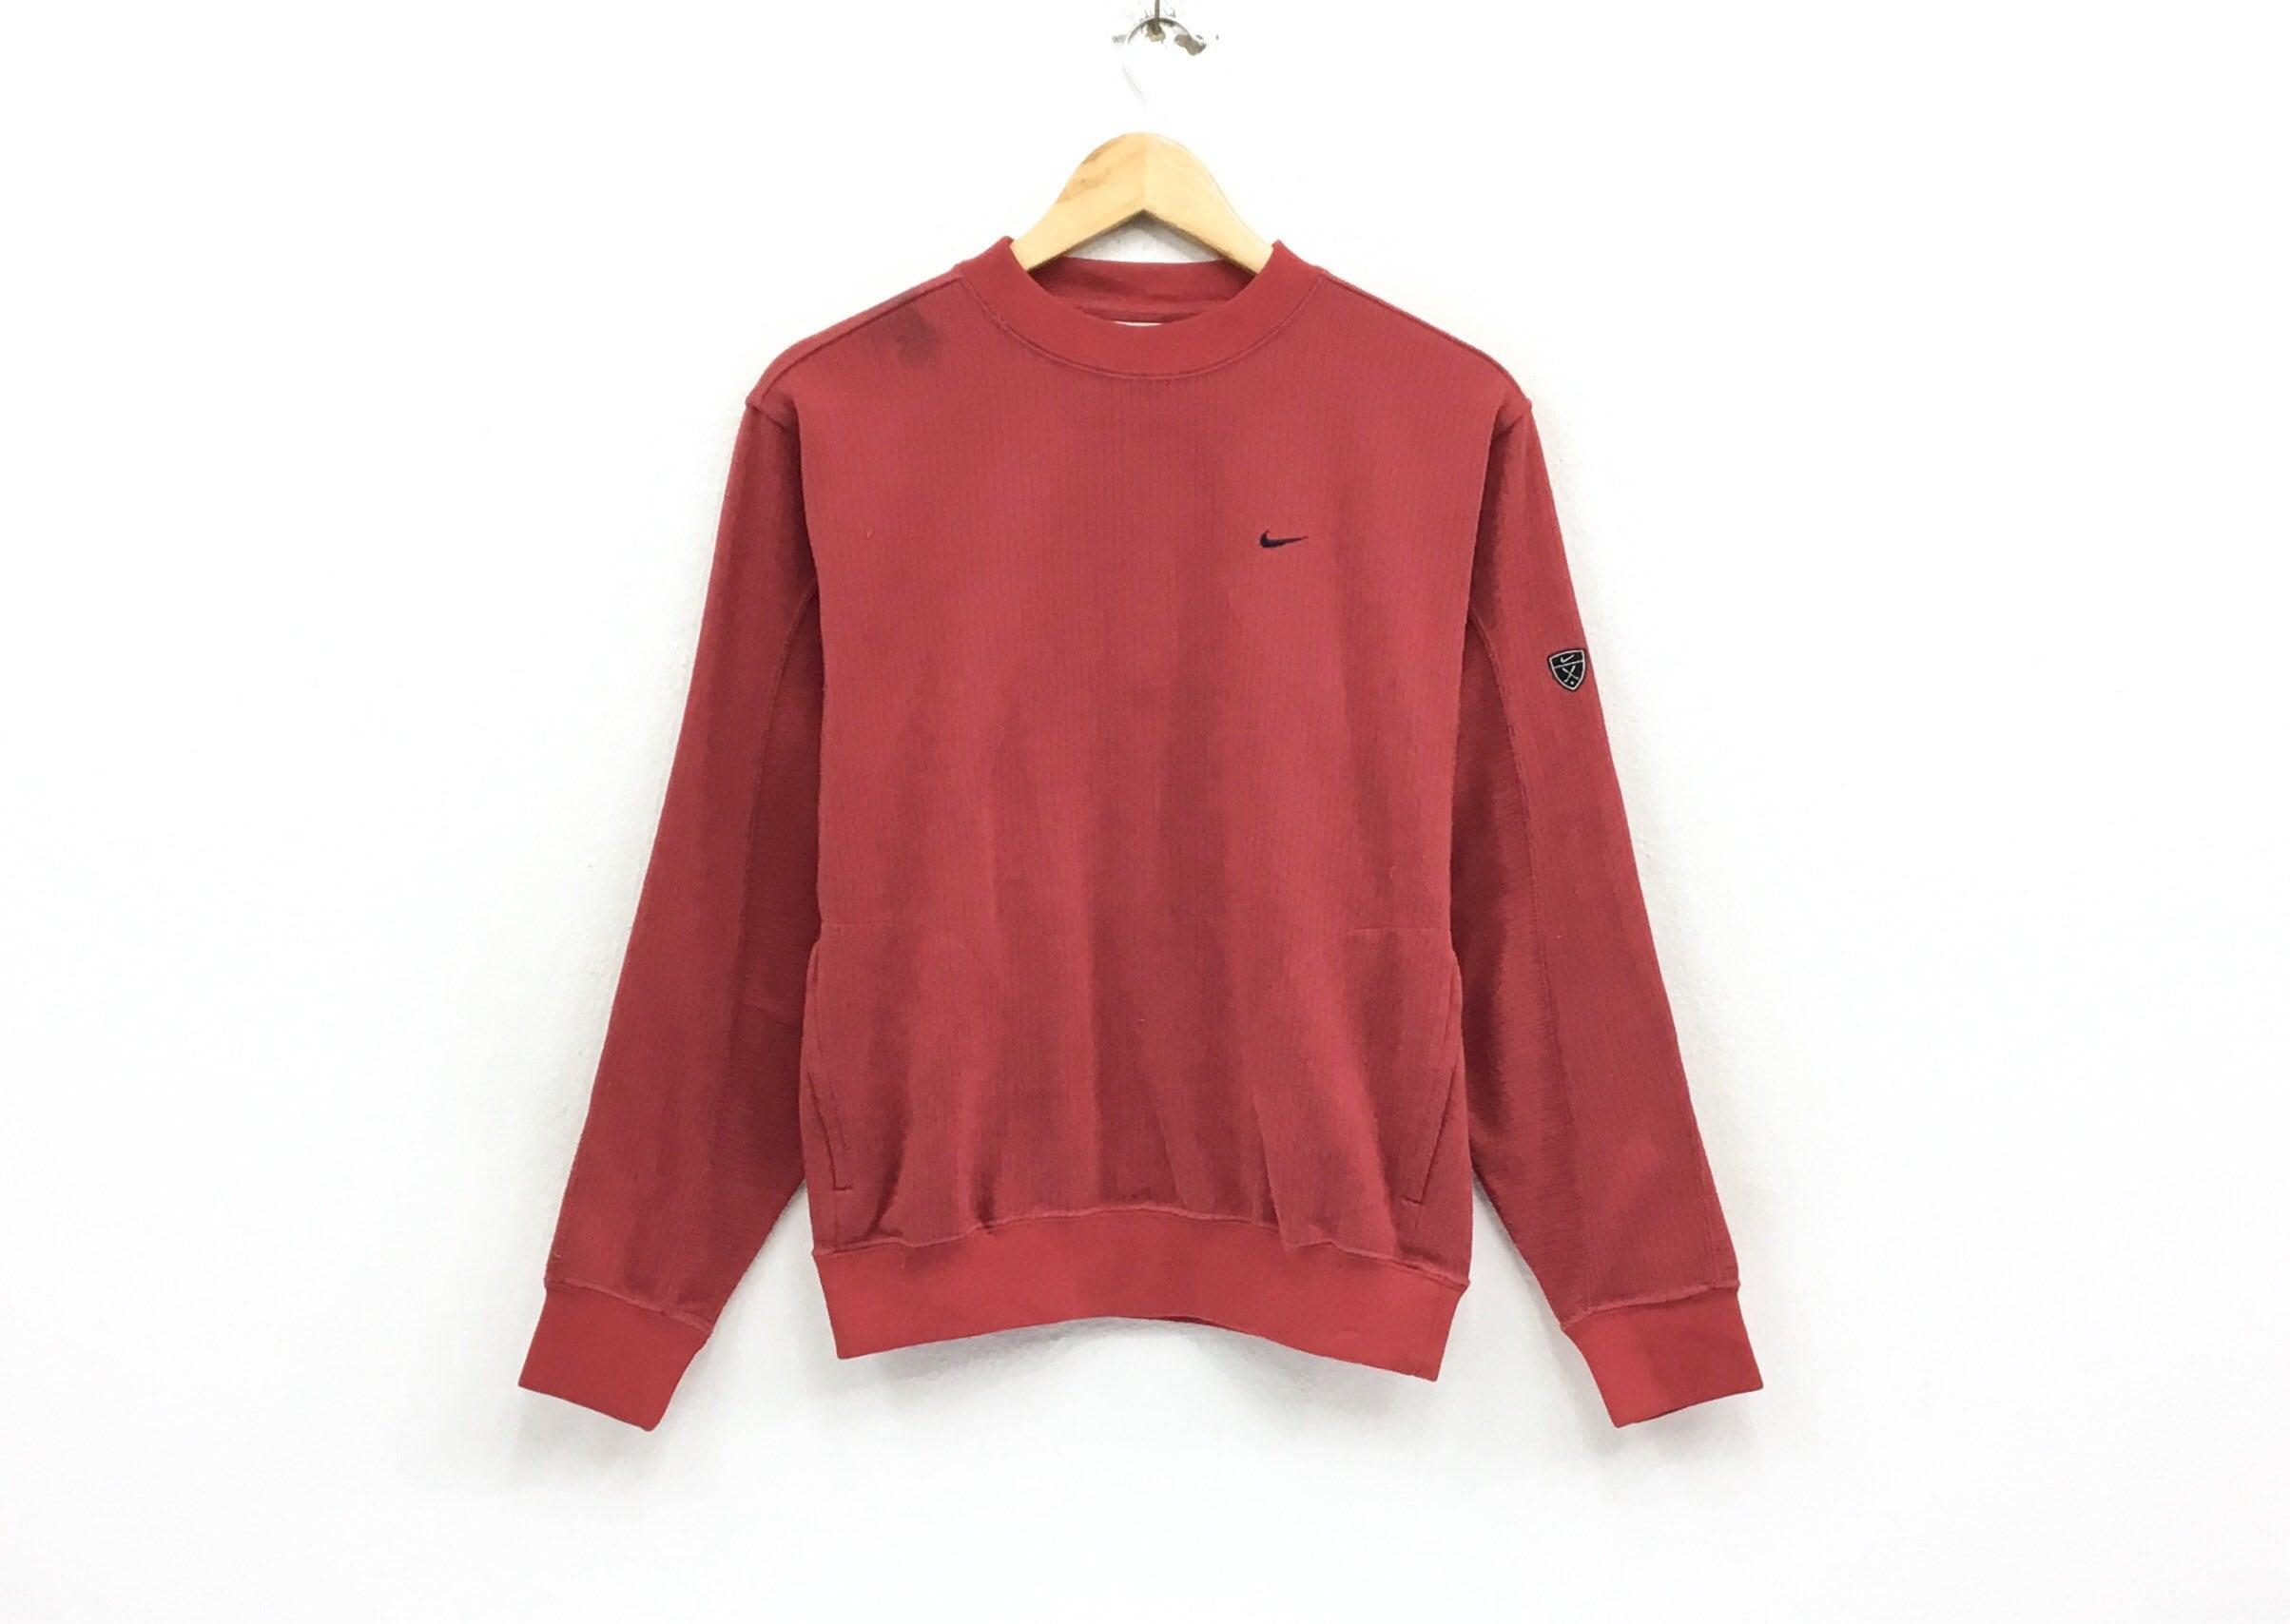 ff738eba74041 Nike Golf Crewneck Sweatshirt Jumper Embroidery Small Logo Pullover /  Sports Brand / Streetwear / Small Size / Fashion Style / Red